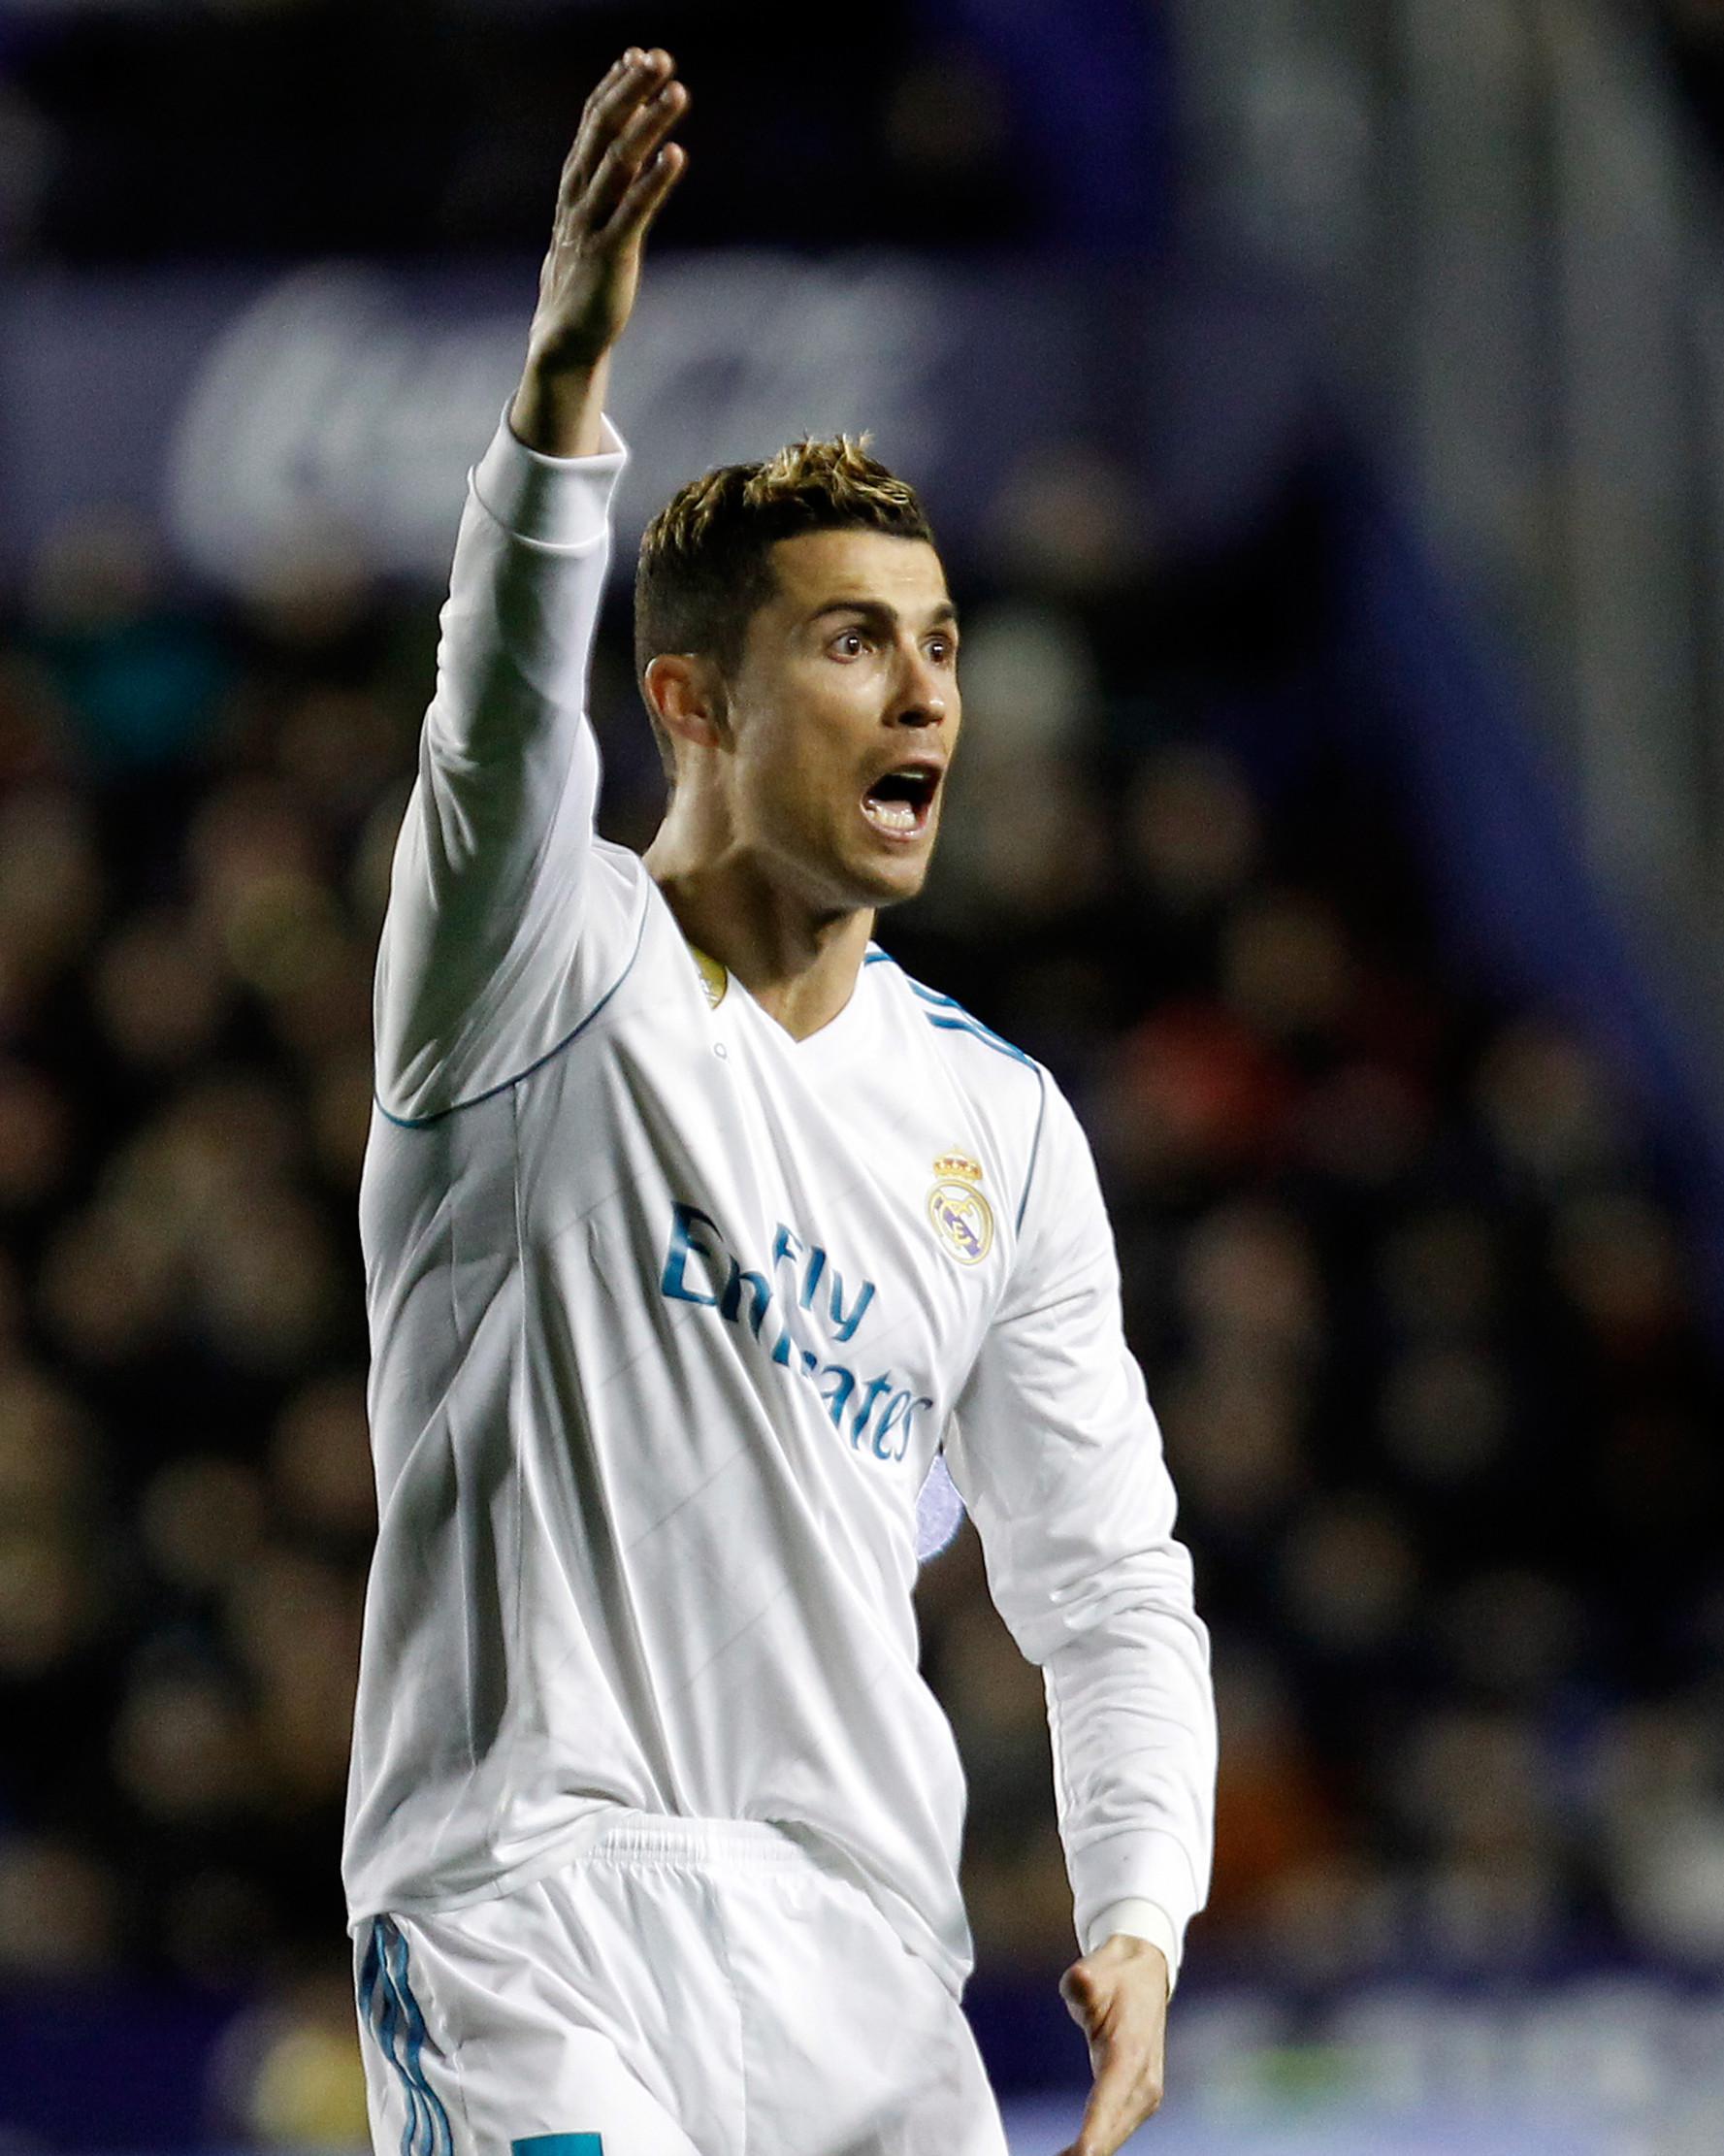 Ekspresi striker Real Madrid Cristiano Ronaldo saat melakukan protes dalam pertandingan Liga Spanyol melawan Levante  di stadion Ciutat de Valencia di Valencia (3/2). (AP Photo/Alberto Saiz)